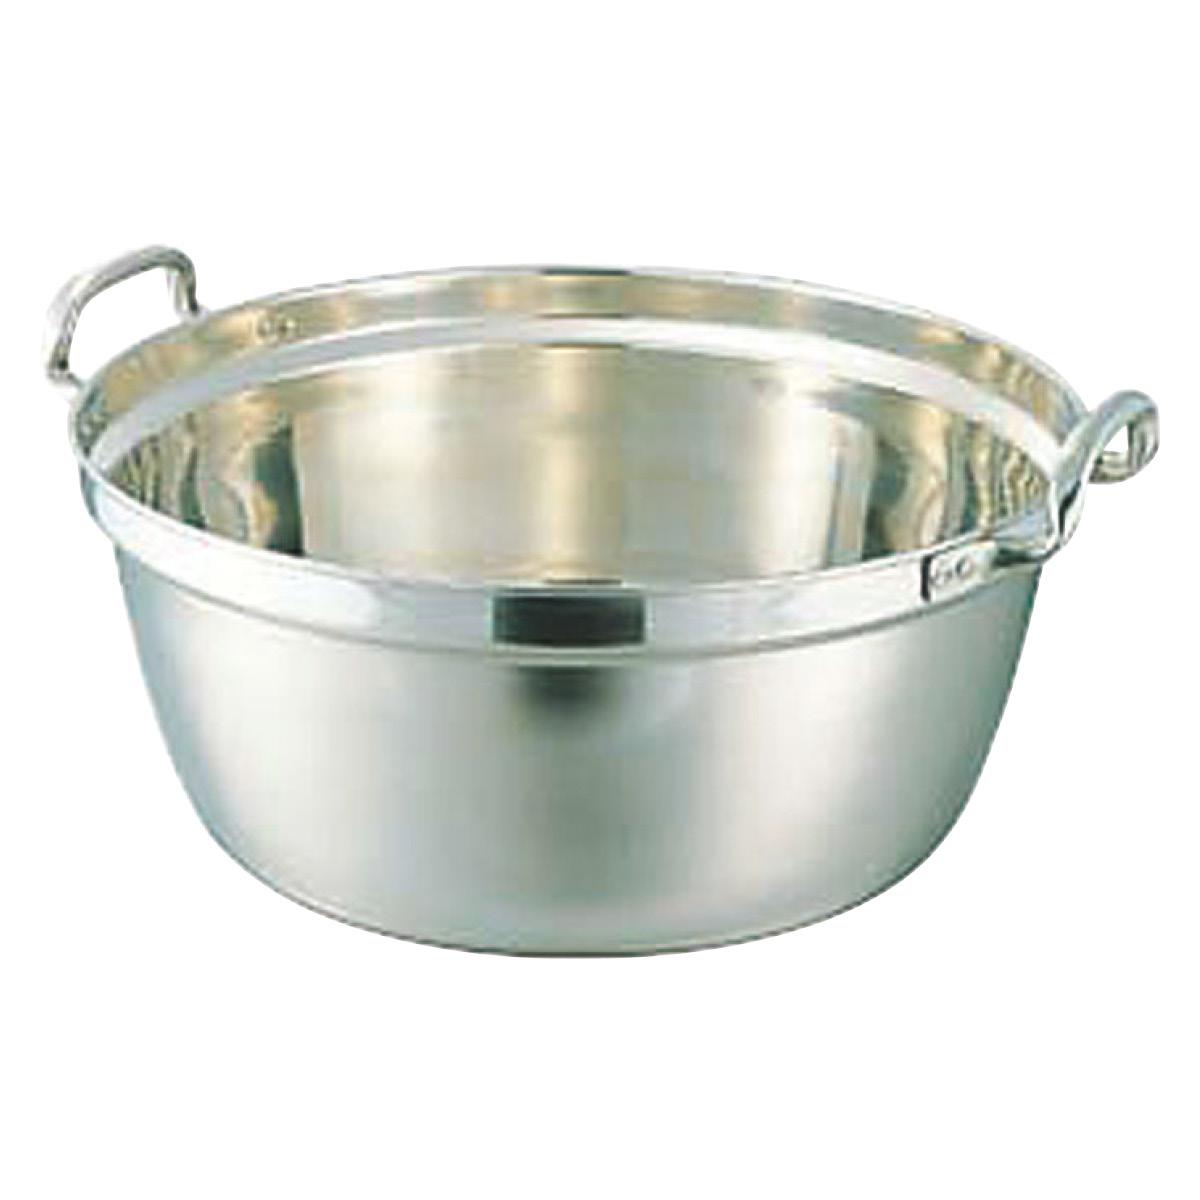 SW 料理鍋 調理用鍋 両手鍋 ステンレス 年中無休 36cm 14.6L 18-8ST料理鍋 海外輸入 燕三条 日本製